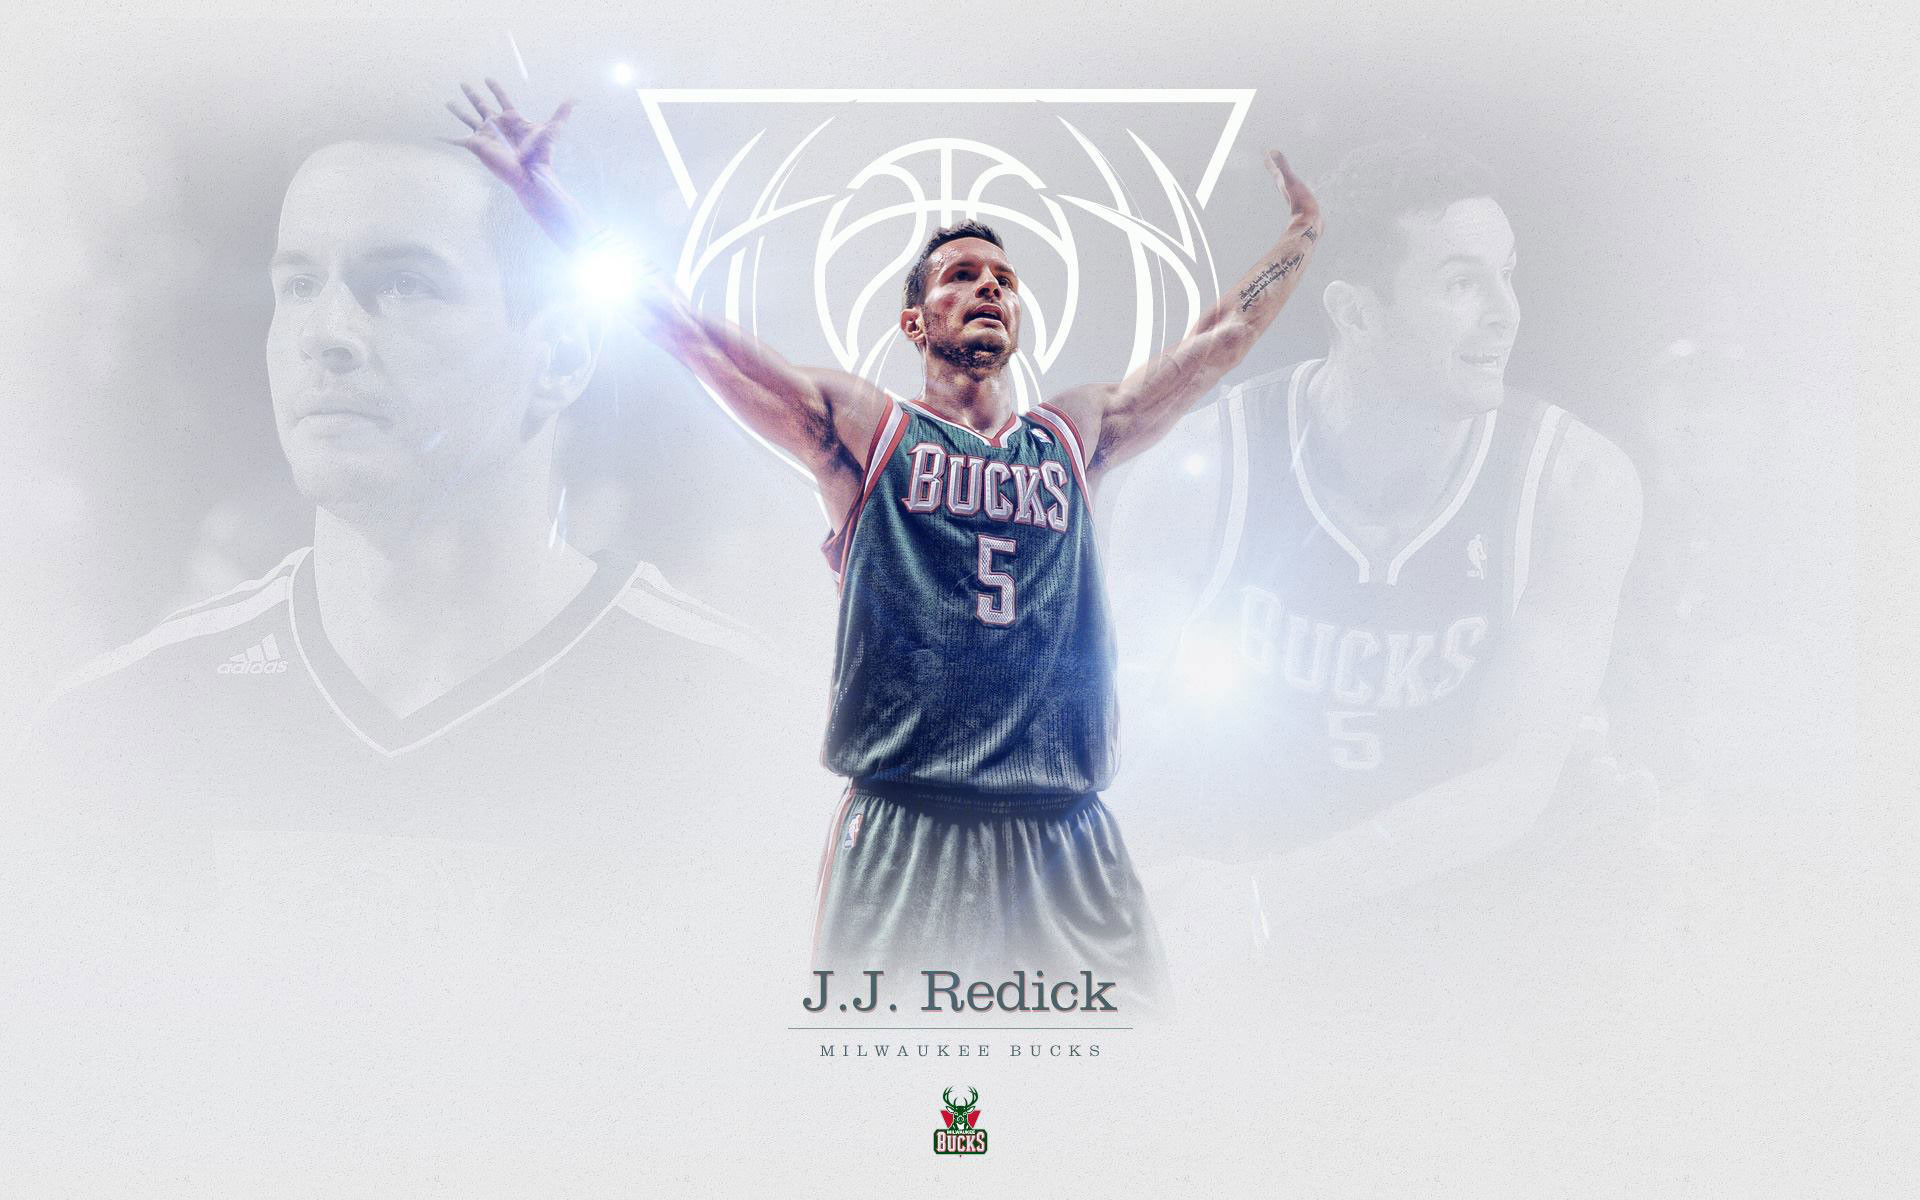 J. J. Redick Bucks Wallpaper